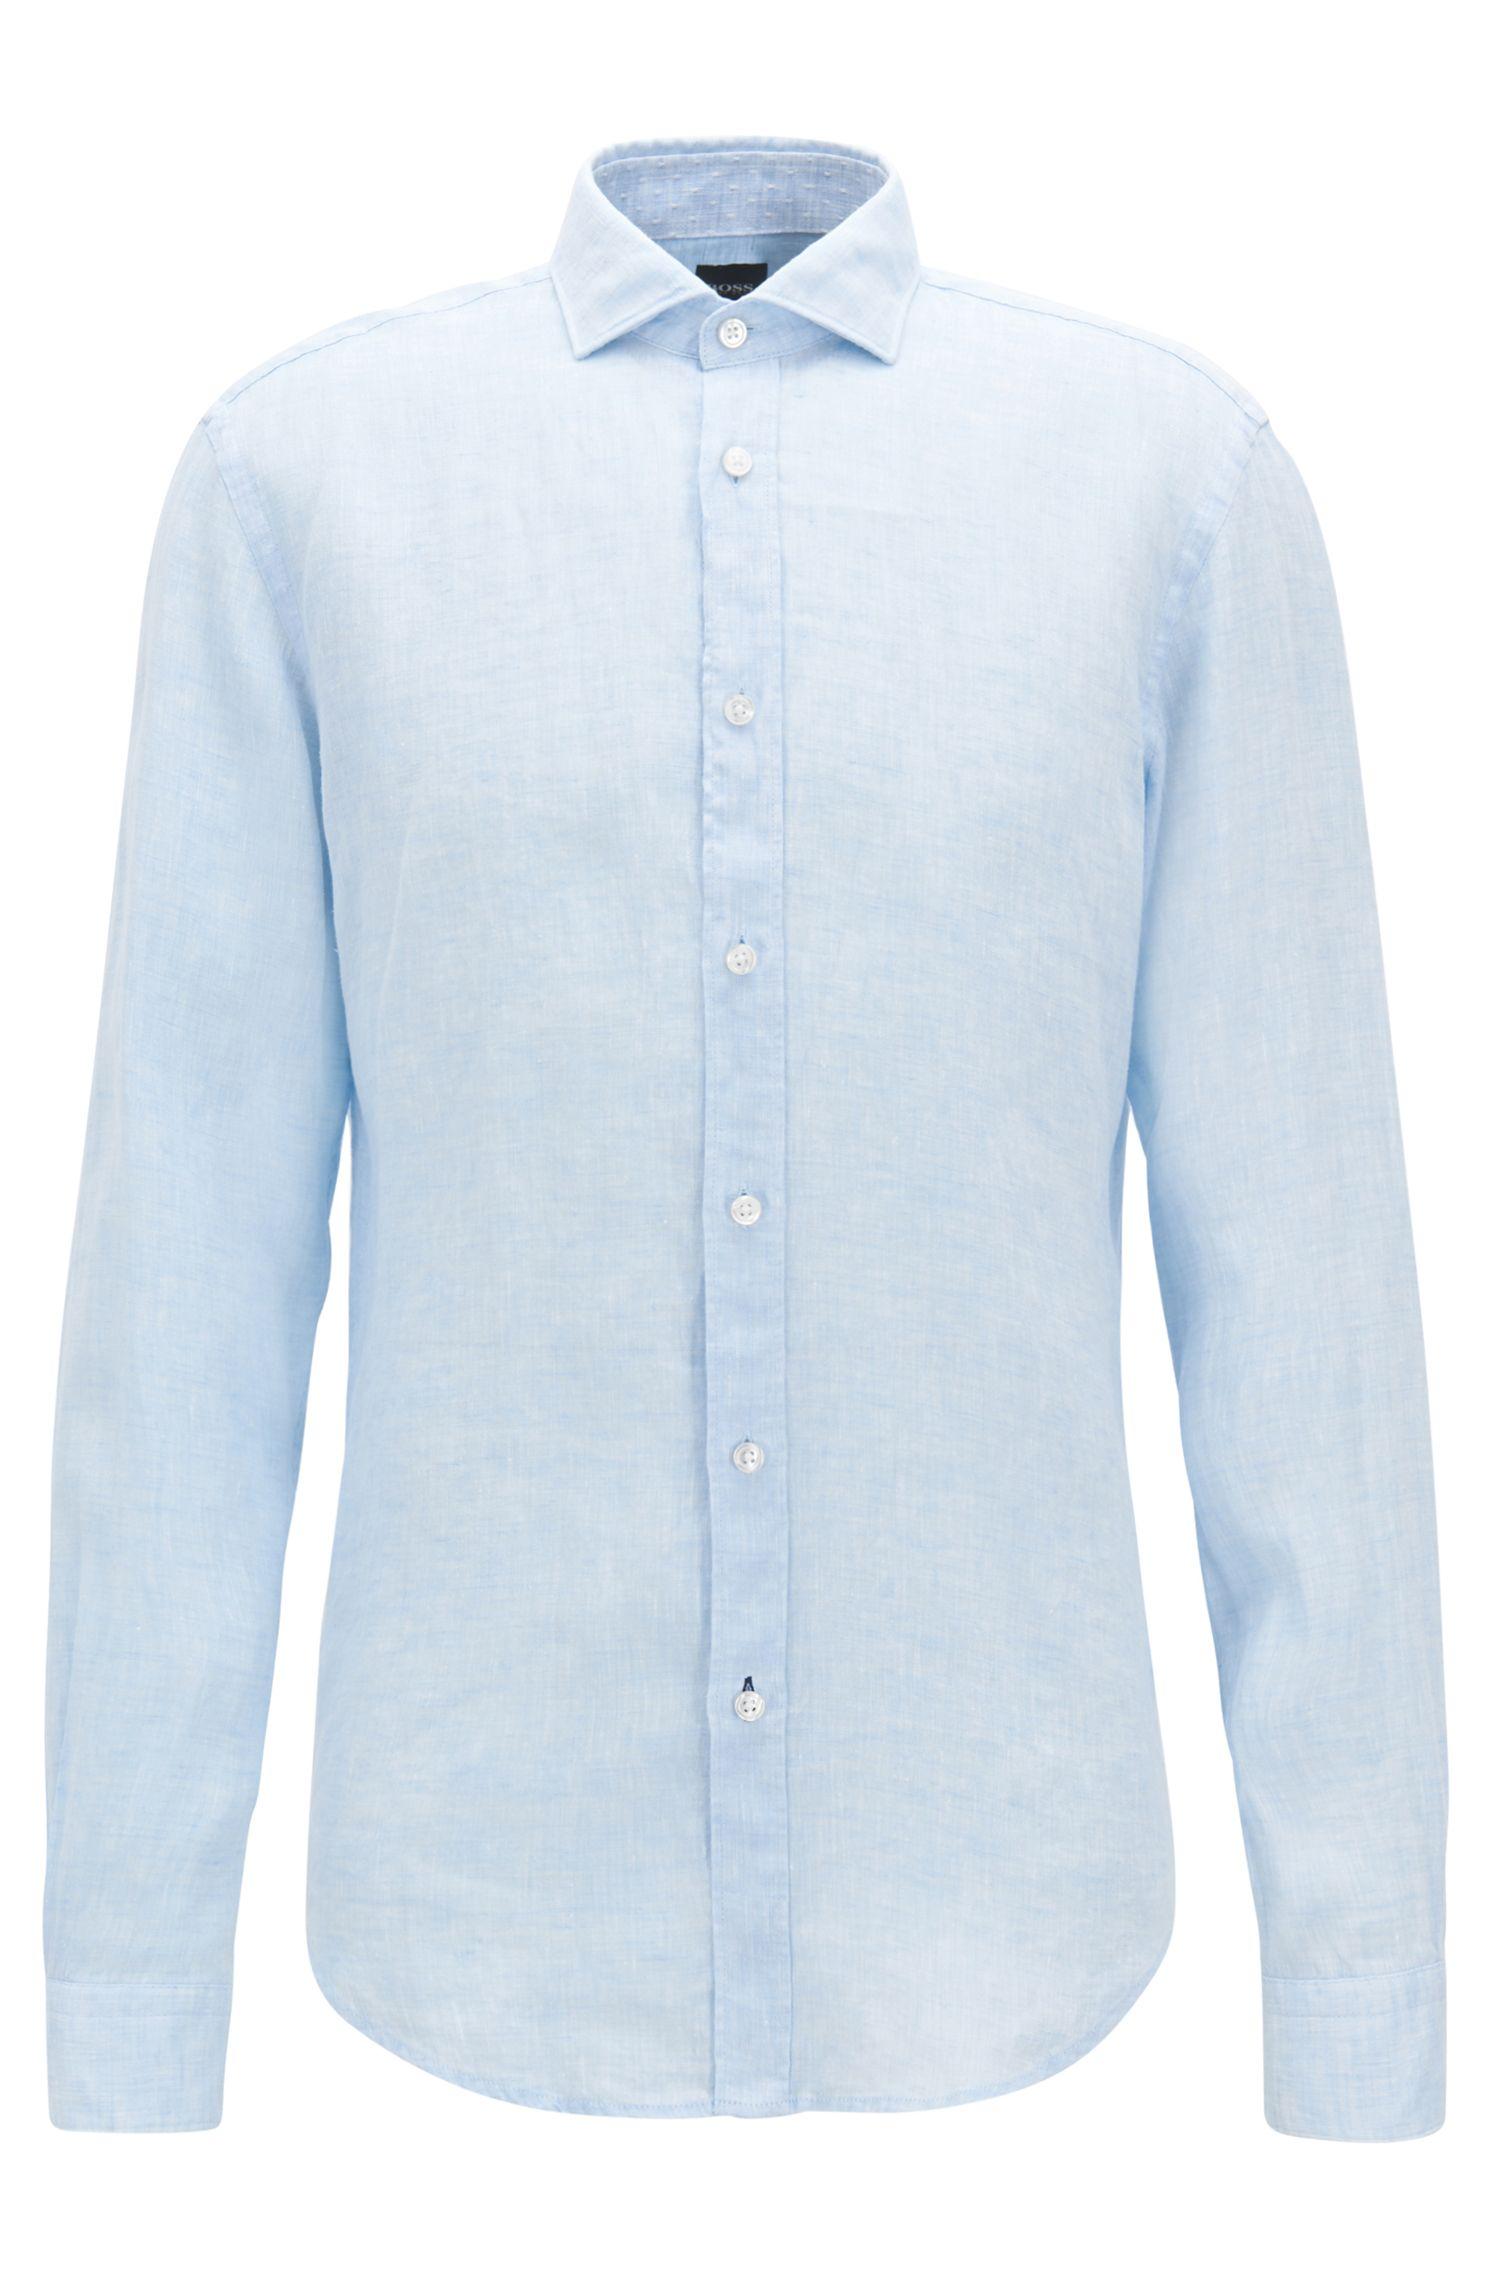 Slub Linen Sport Shirt, Slim Fit | Ridley, Dark Blue